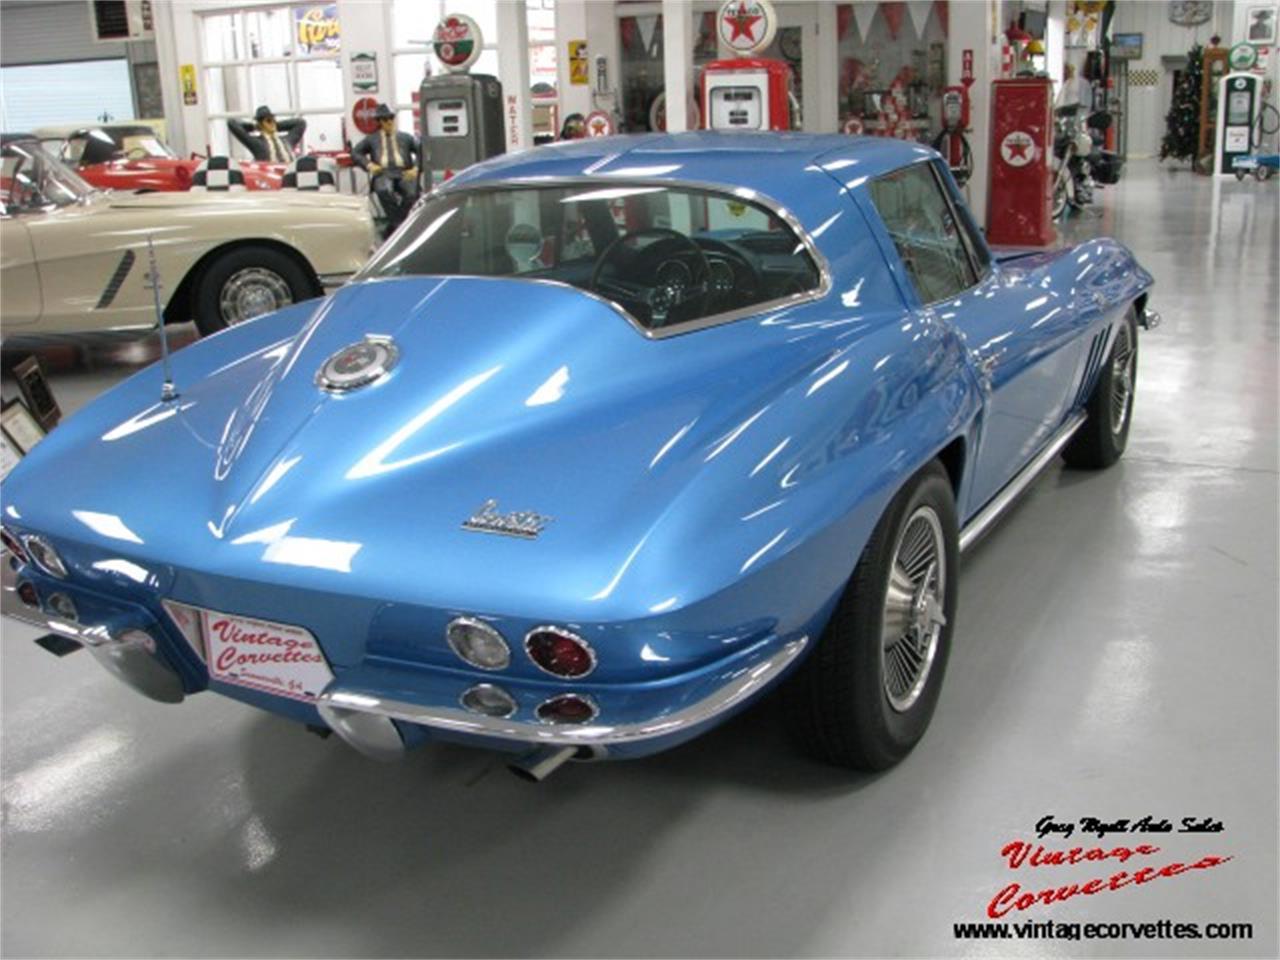 1966 Chevrolet Corvette (CC-1414718) for sale in Summerville, Georgia